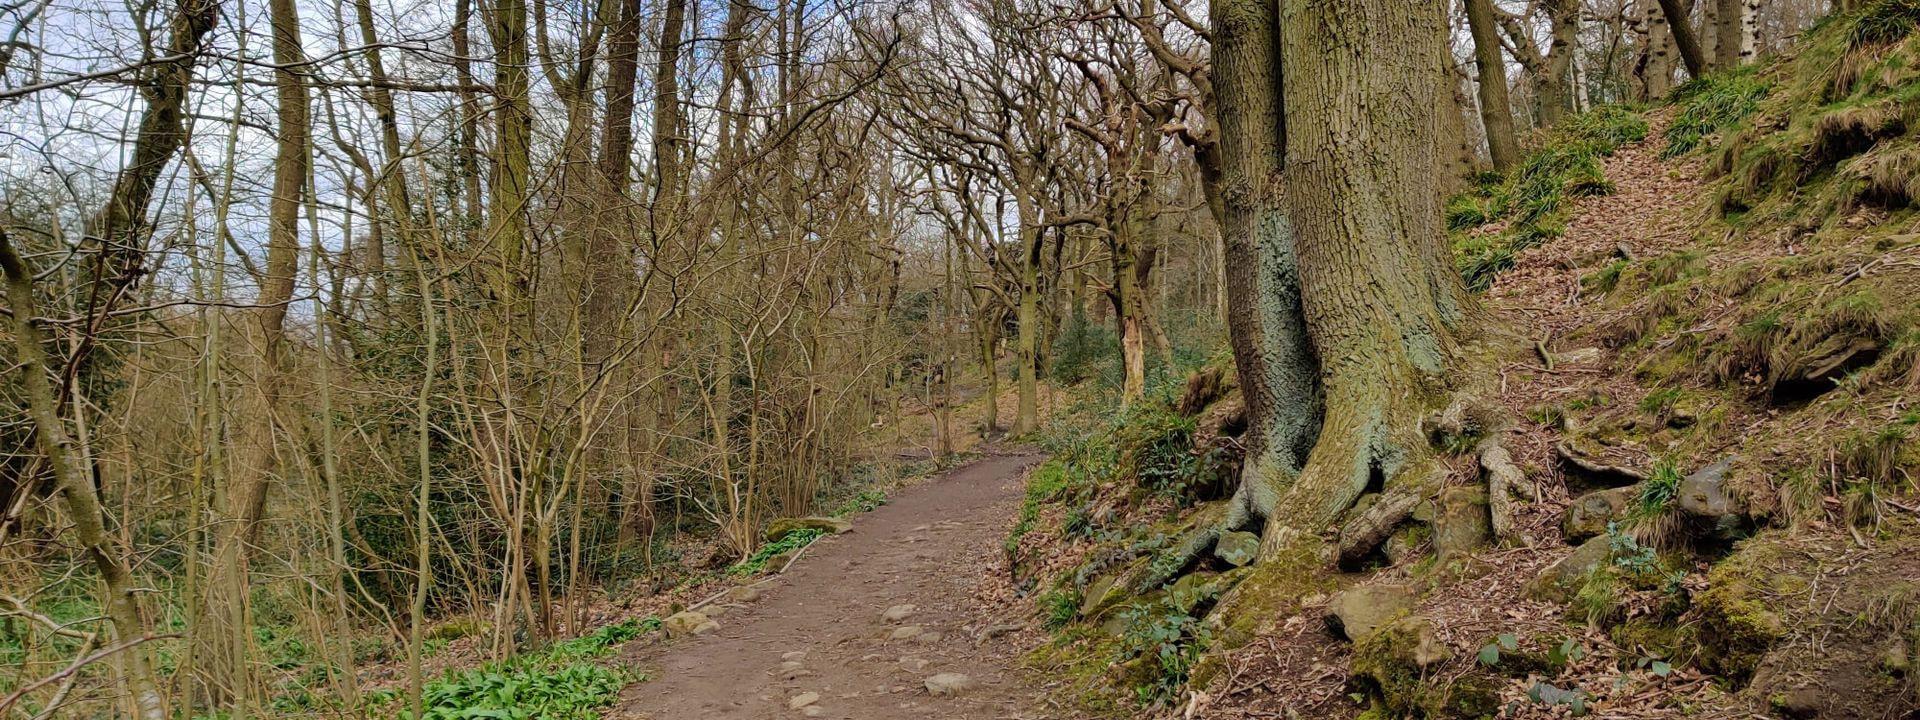 Path through Hetchell Woods